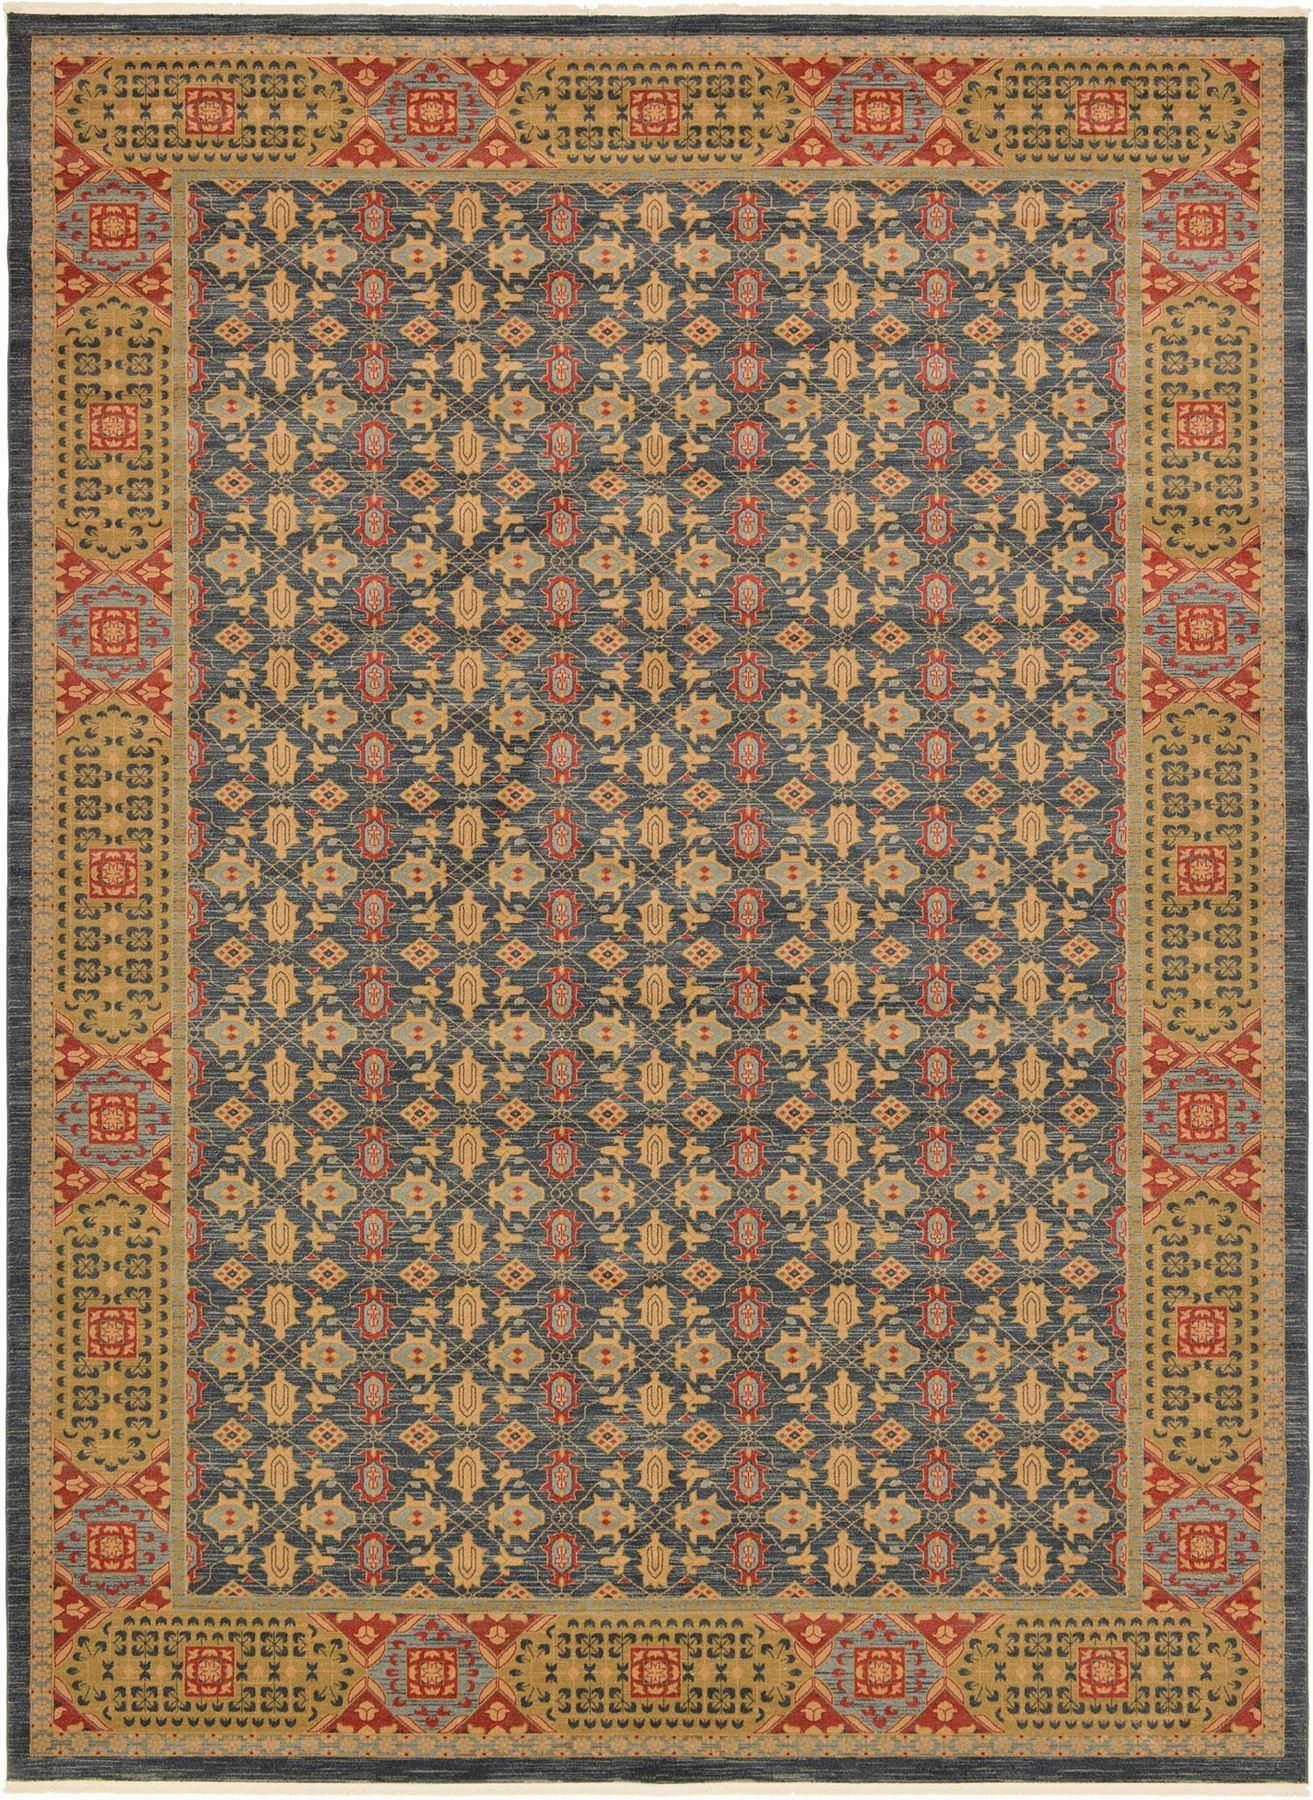 persian design traditional area rug oriental floral large. Black Bedroom Furniture Sets. Home Design Ideas